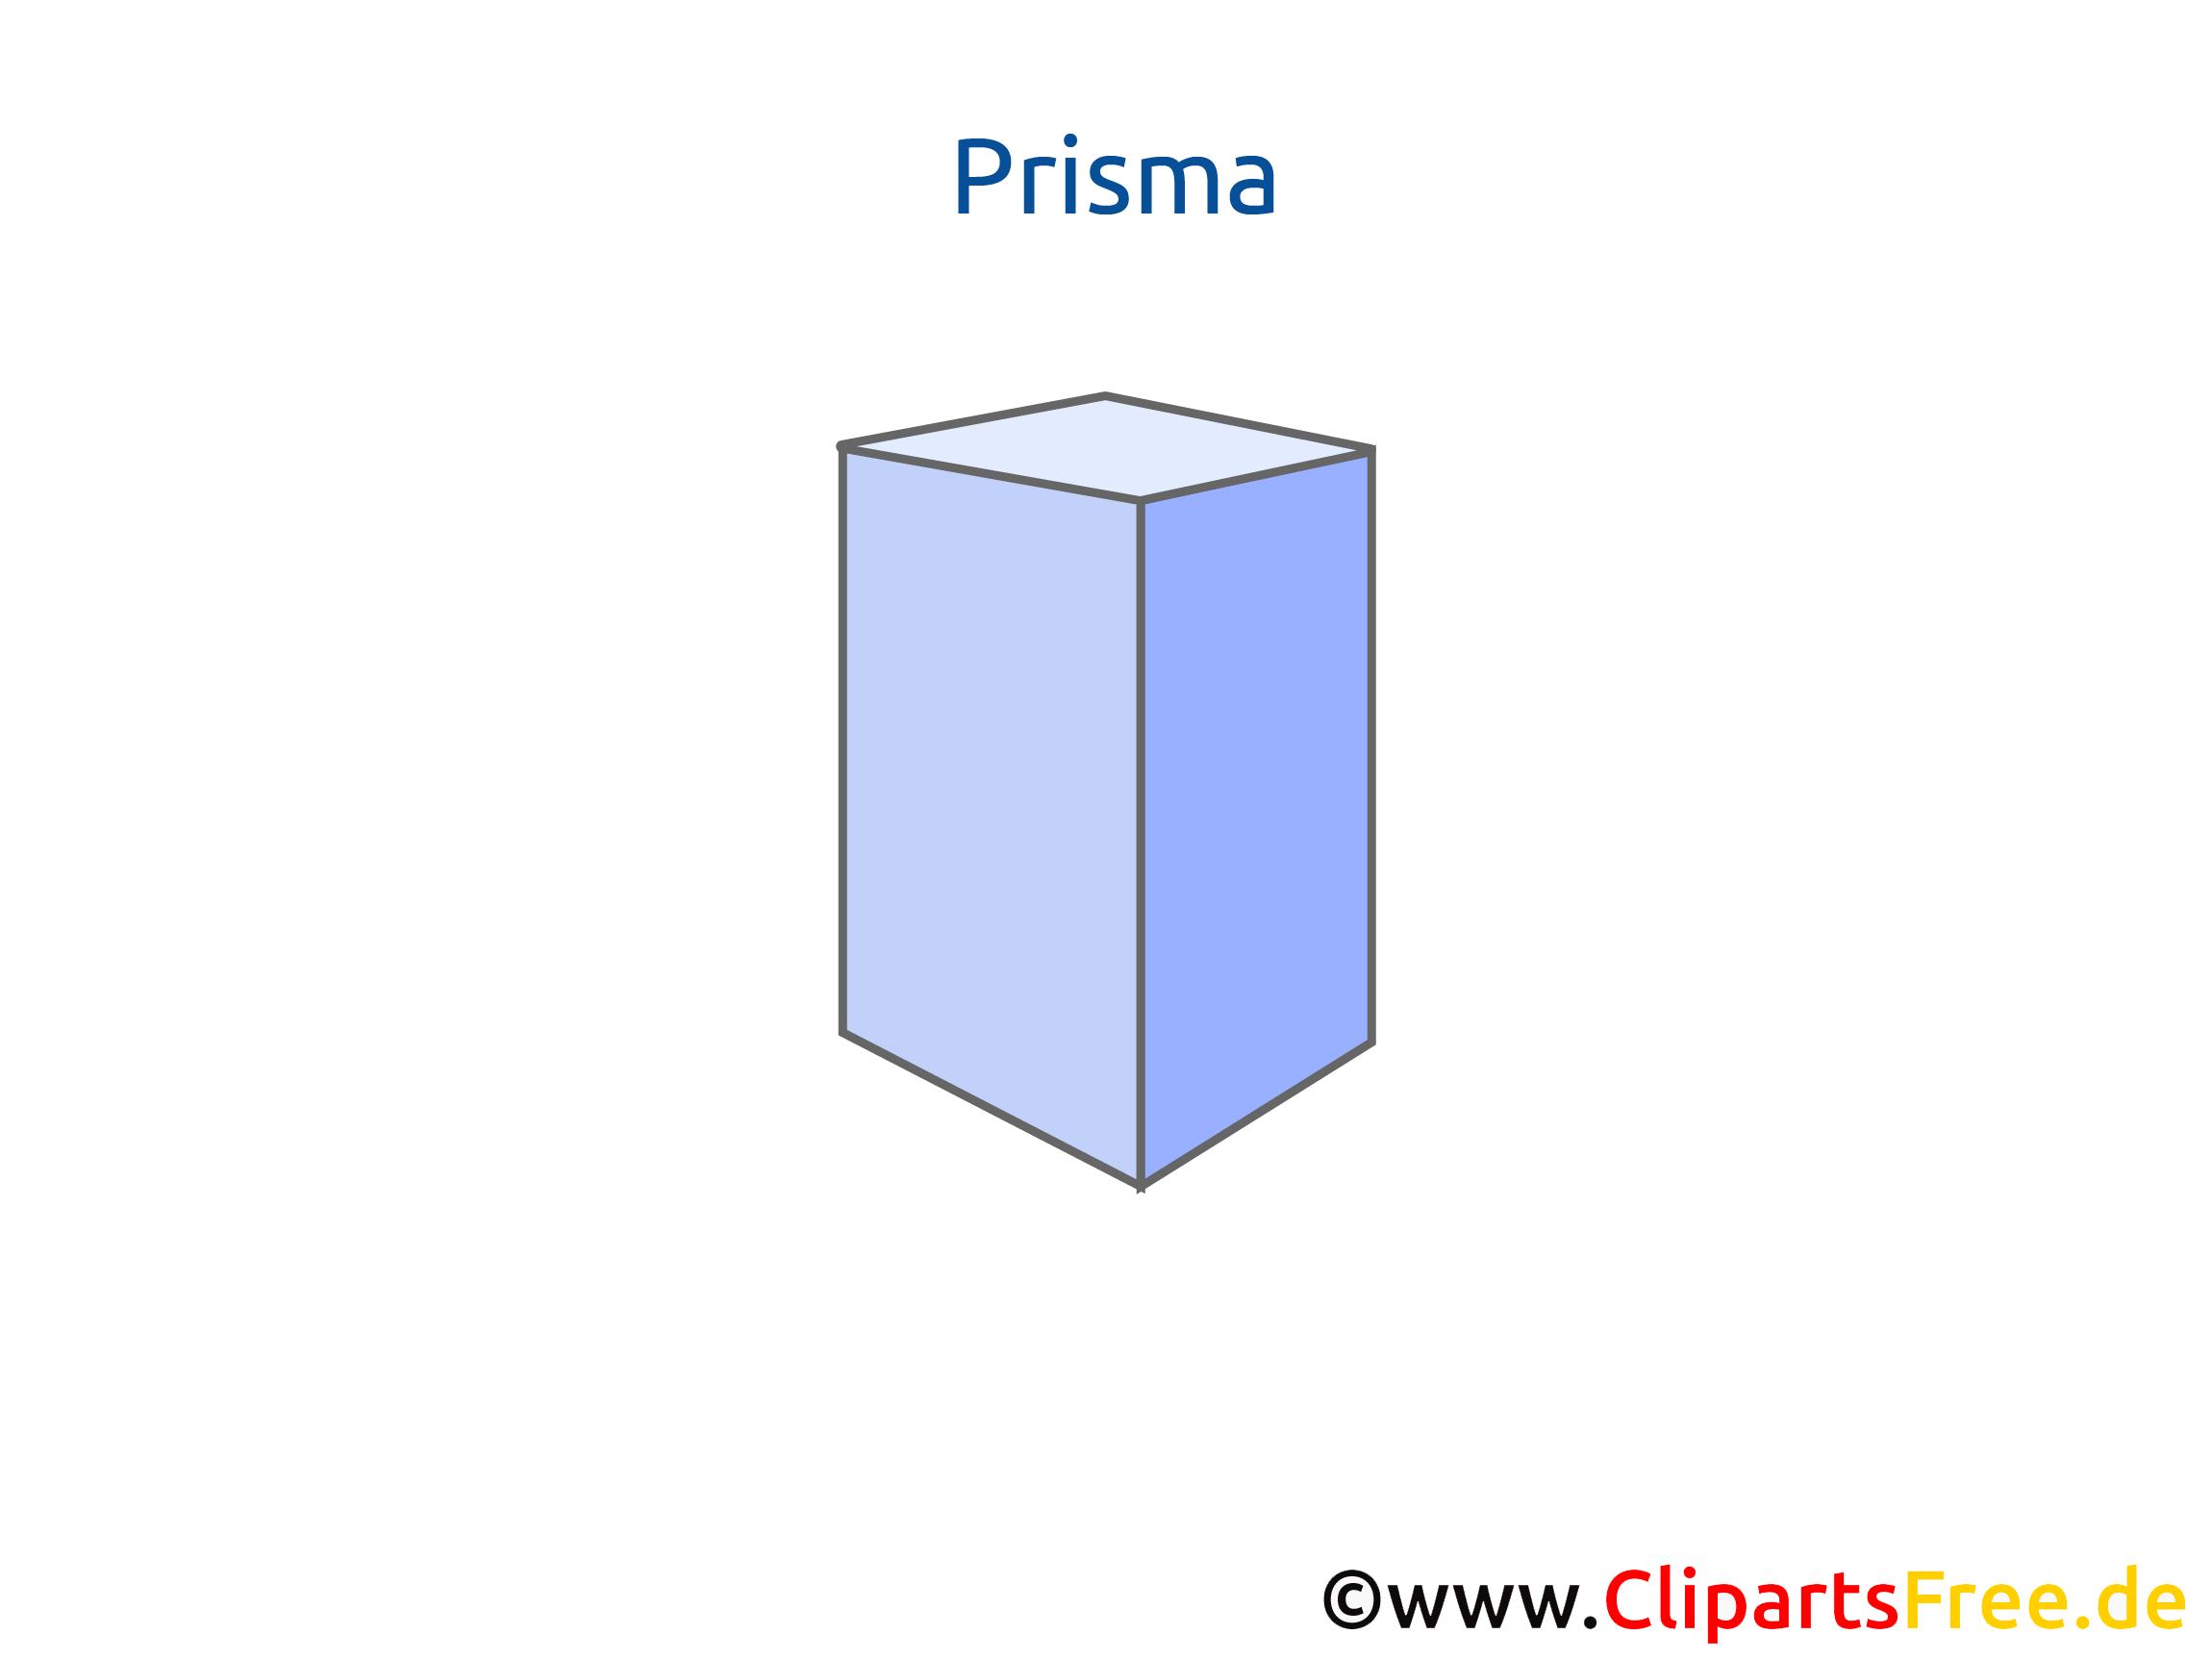 Prisma Mathe-Arbeitsblätter zu Geometrie